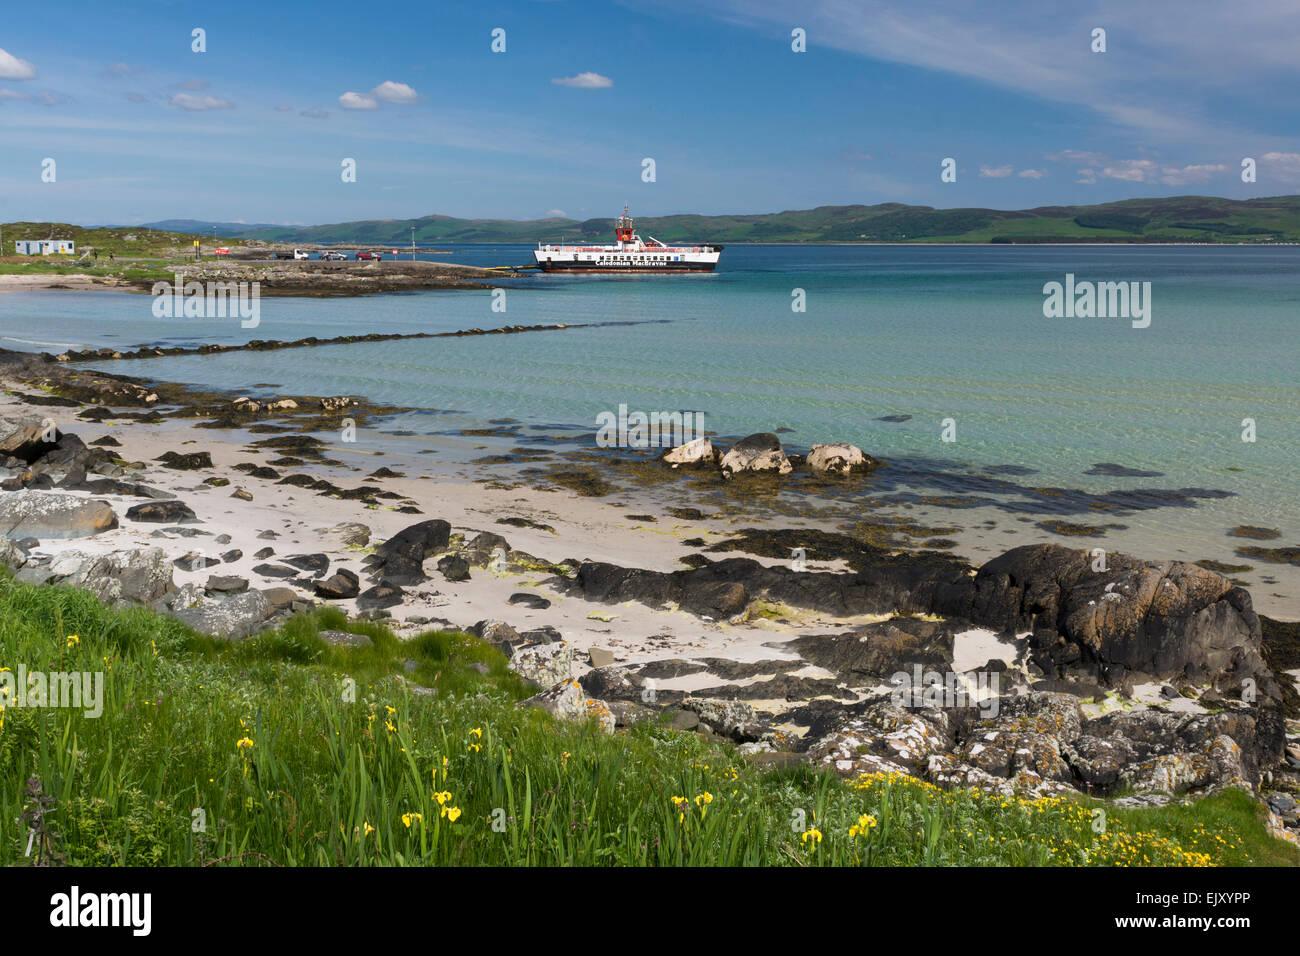 La isla de Gigha inner hebrides con playa plus calmac ferry Foto de stock